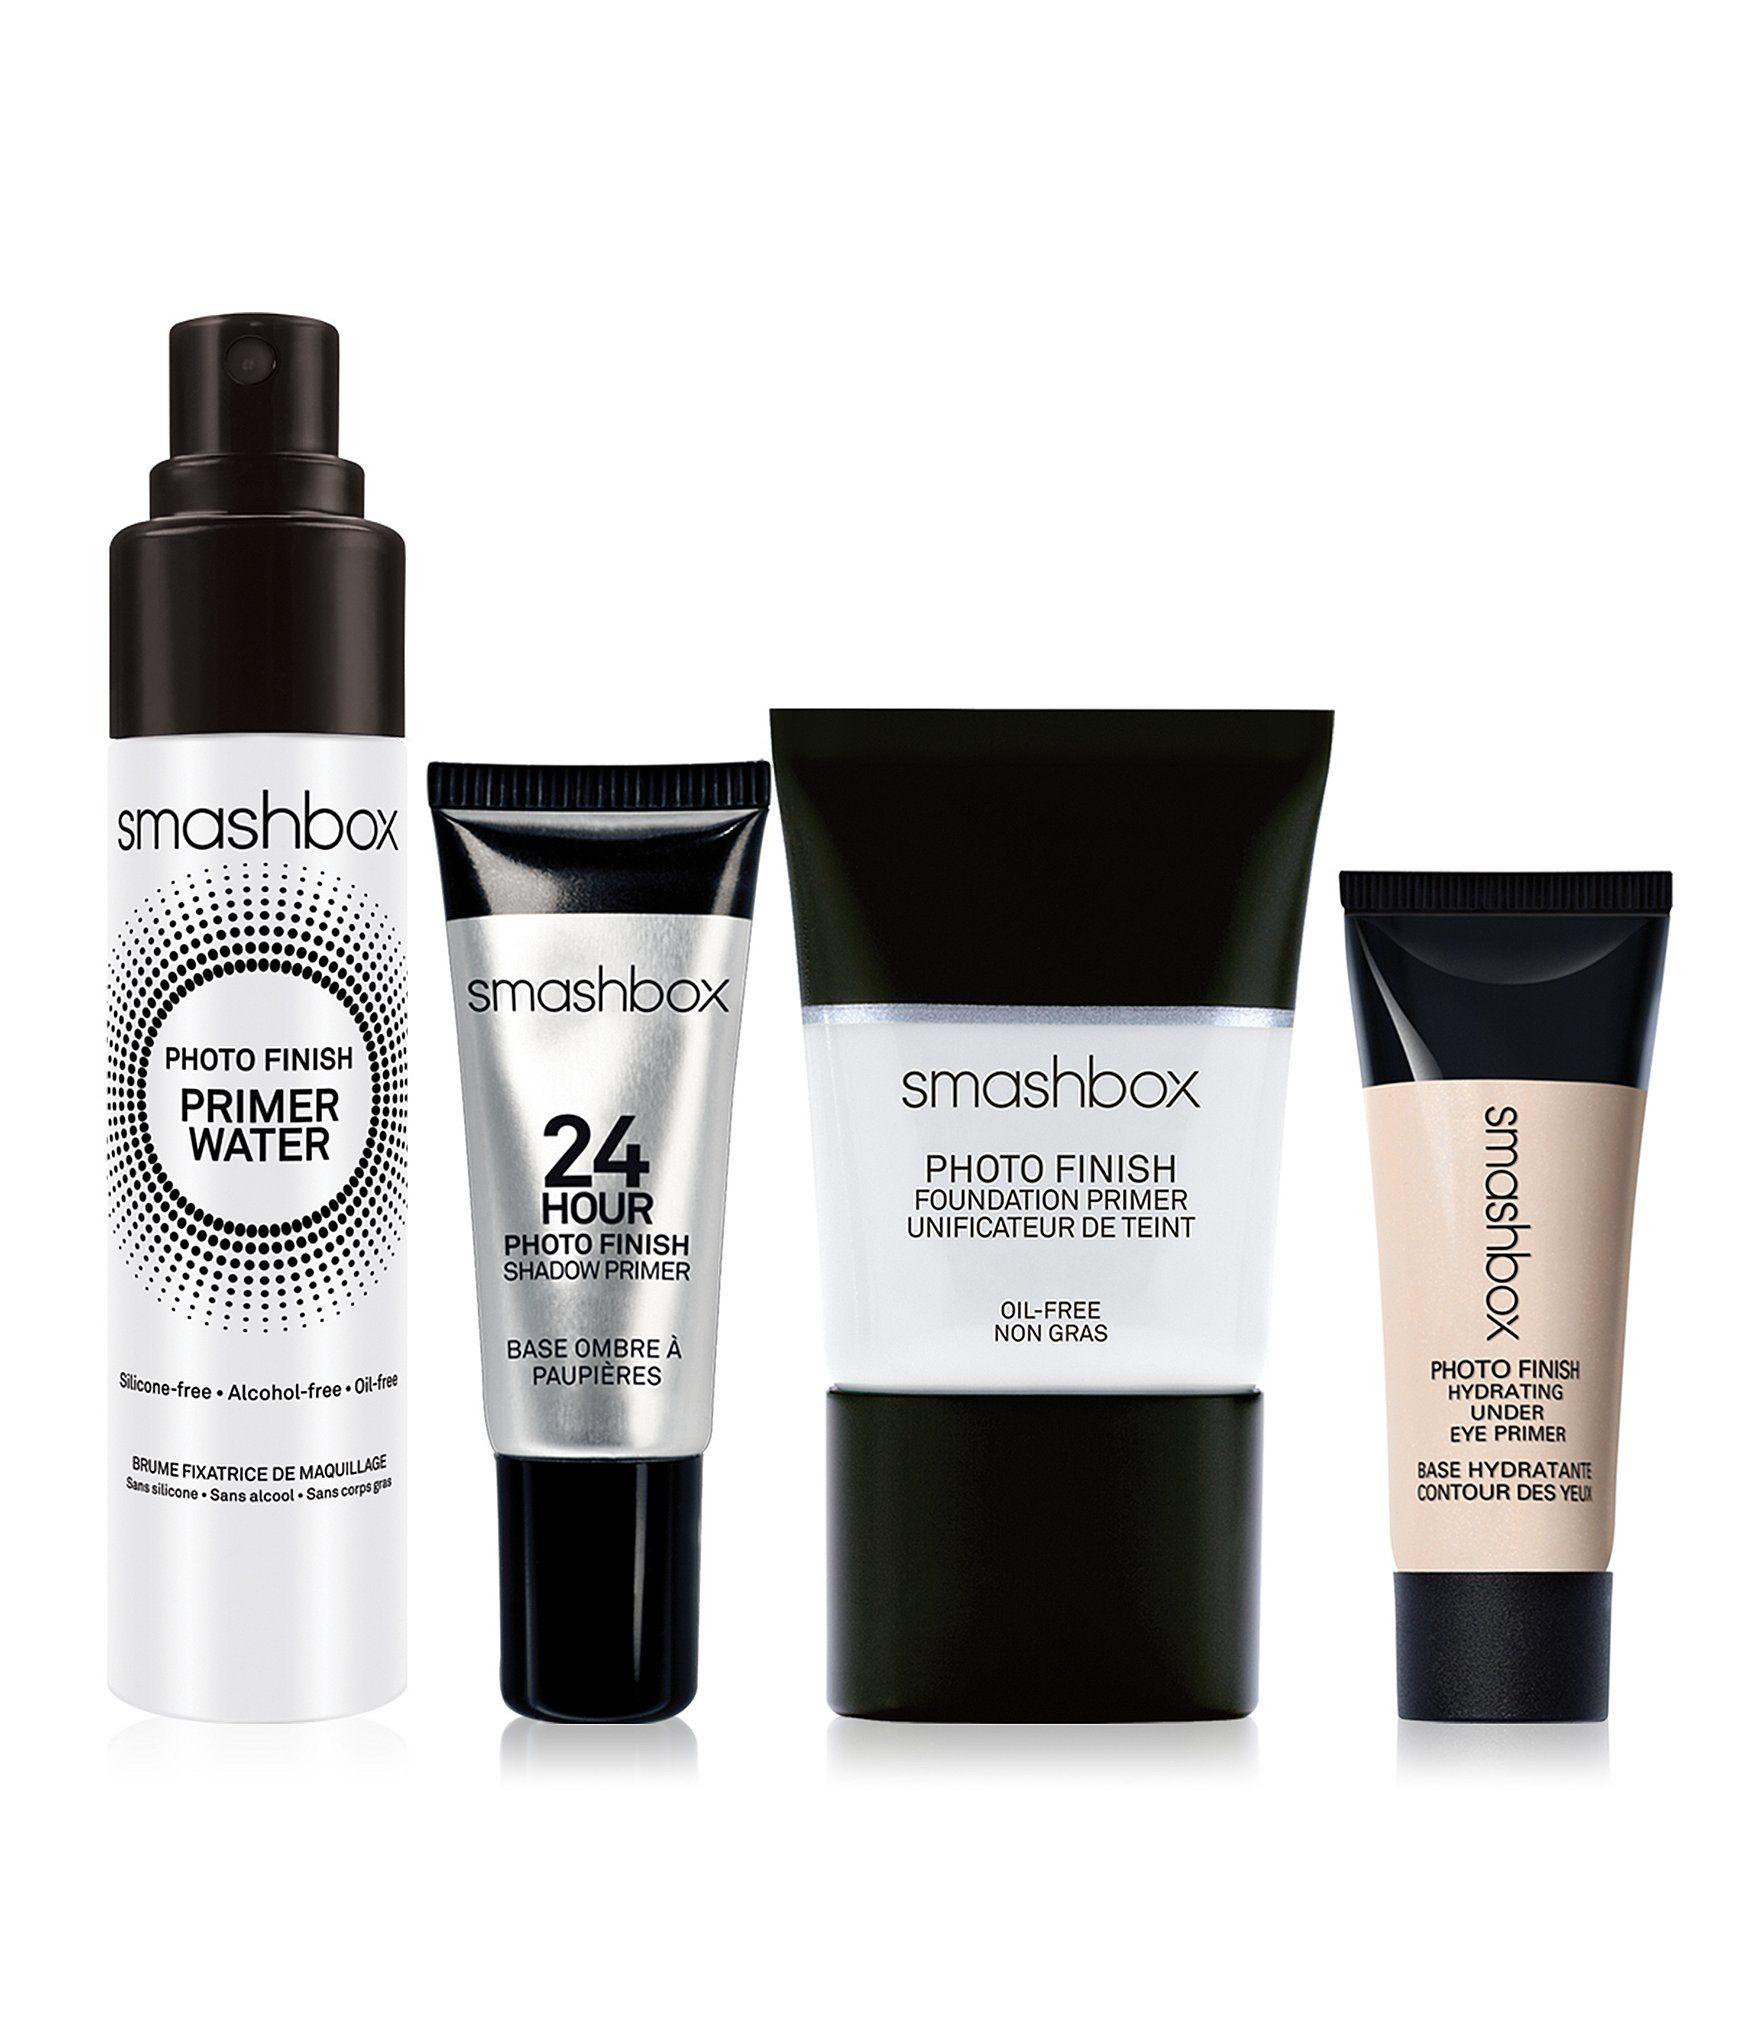 Smashbox Try It Kit Primer Authority In 2020 Smash Box Primer Primer Under Eye Makeup